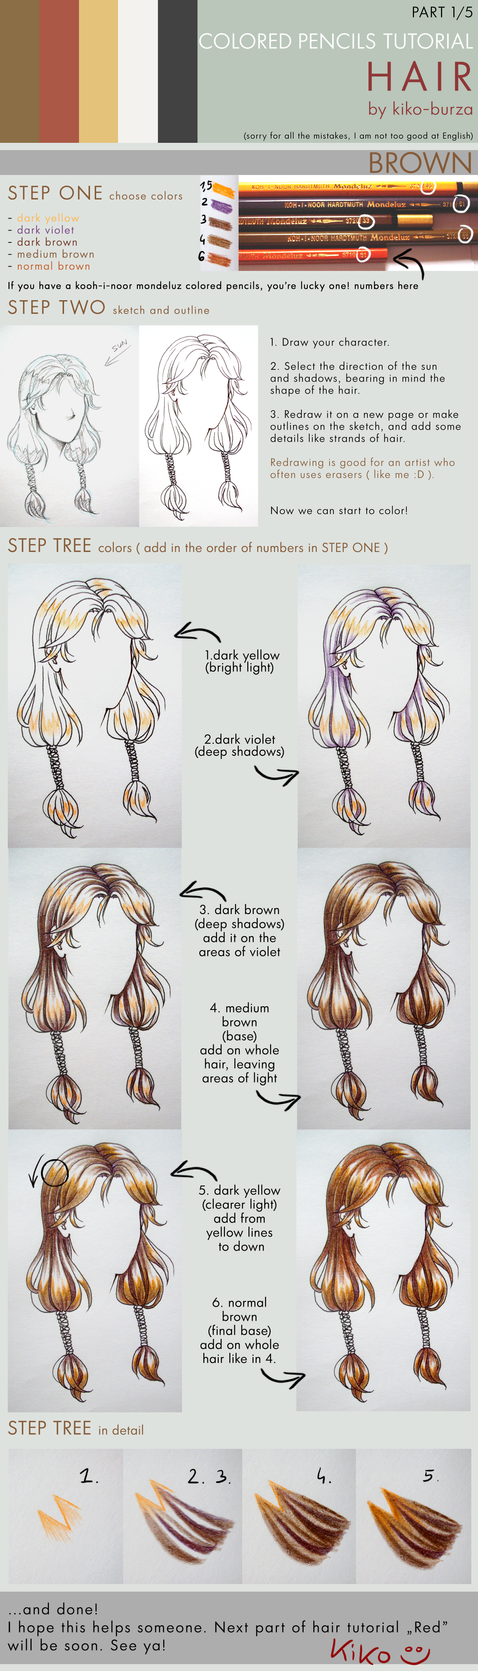 Colored pencils tutorial HAIR part 1 - BROWN by kiko-burza